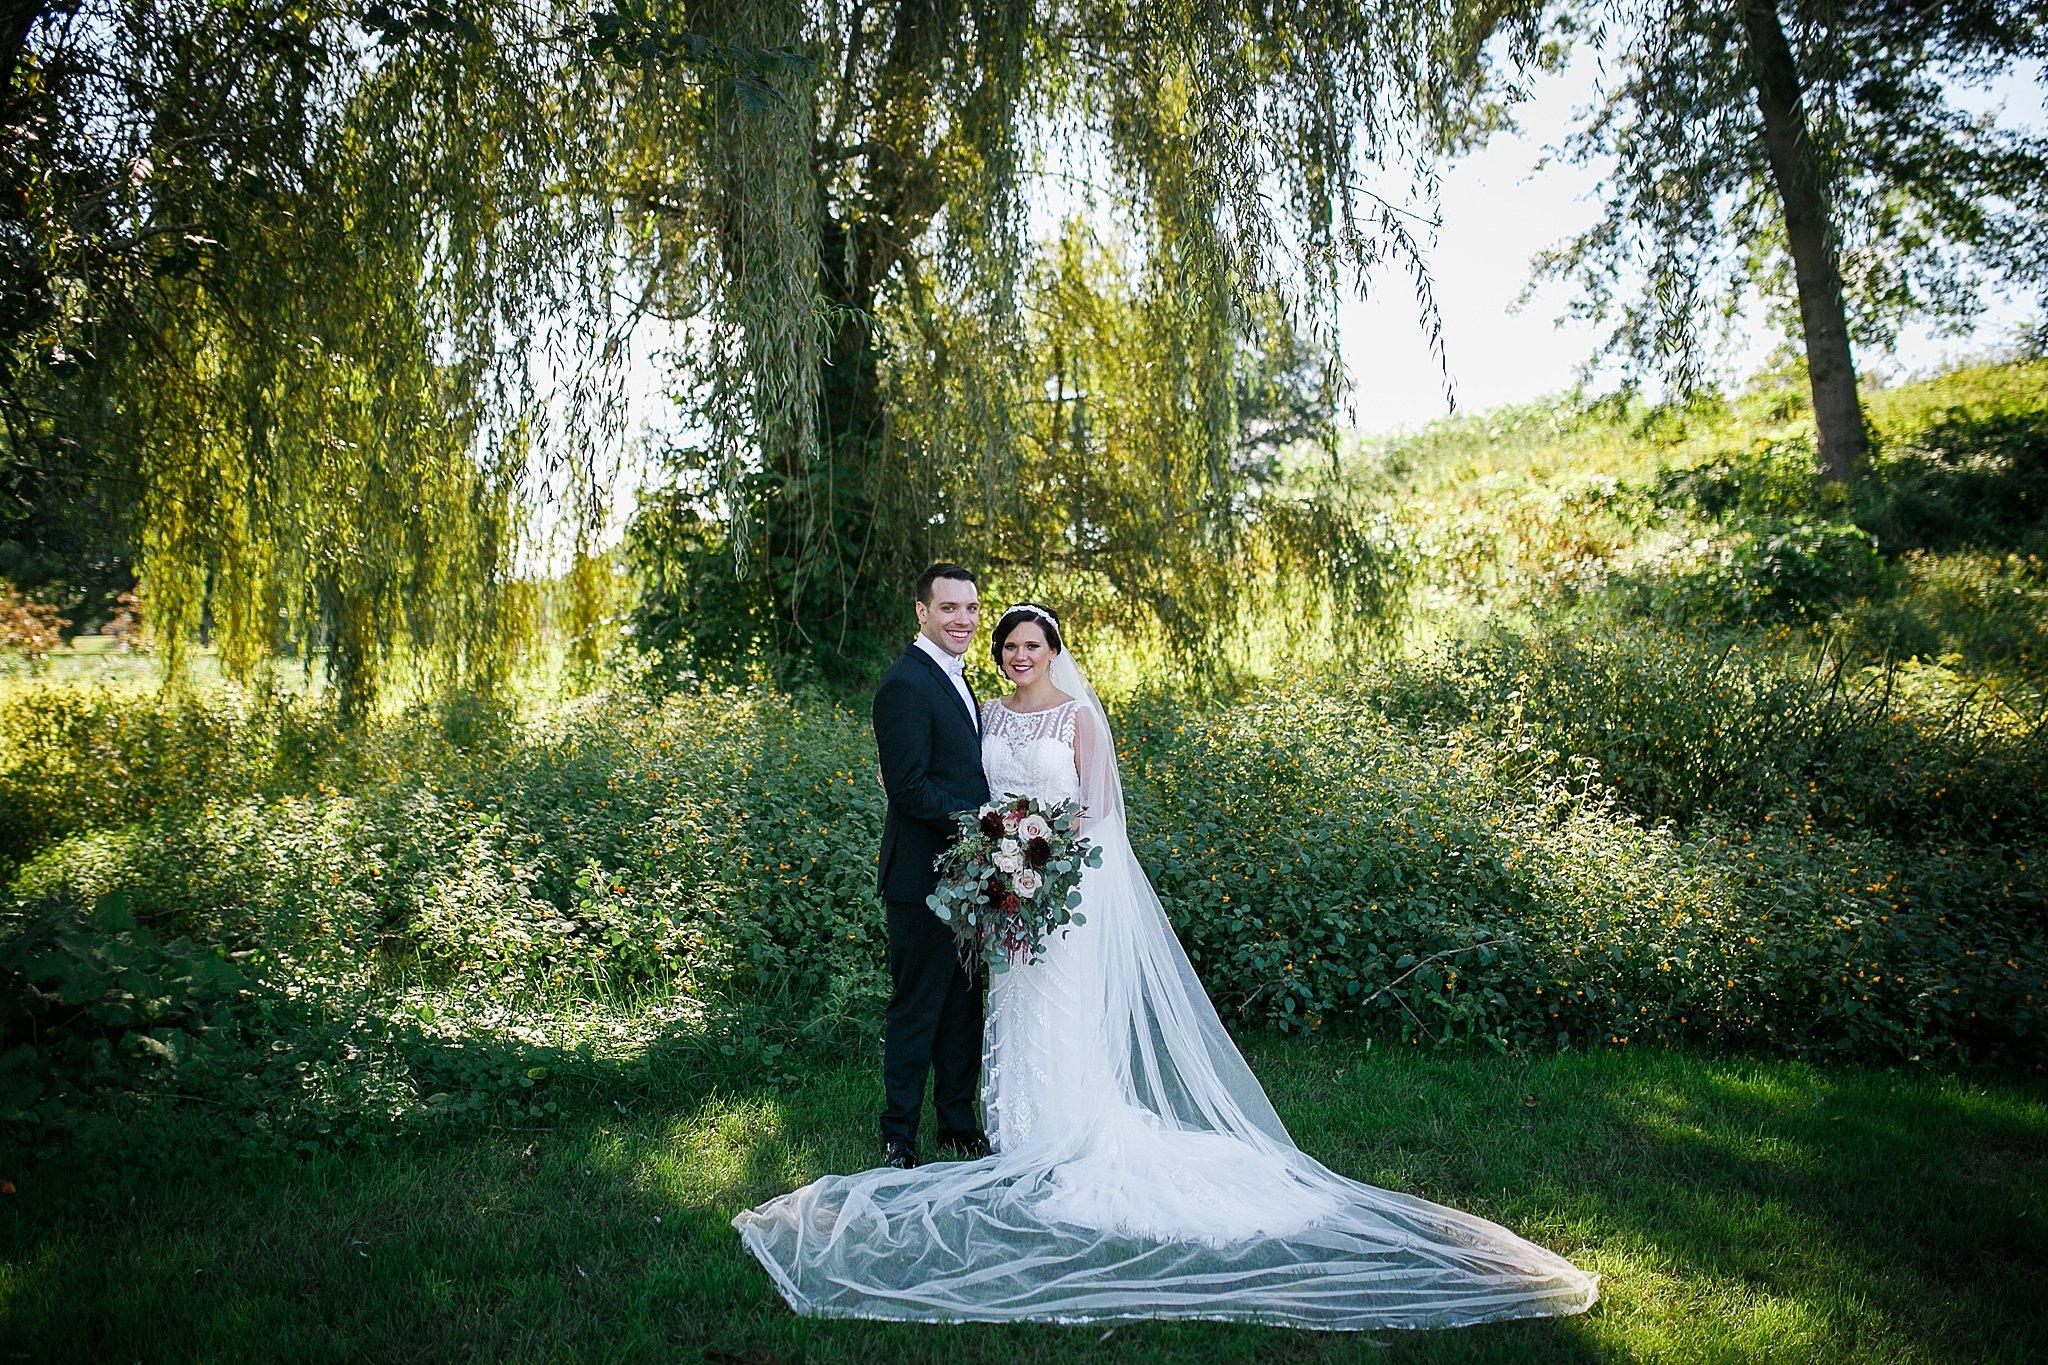 West Hills Country Club Wedding Gatsby Wedding Roaring Twenties Wedding Hudson Valley Wedding Photographer Sweet Alice Photography33.jpg